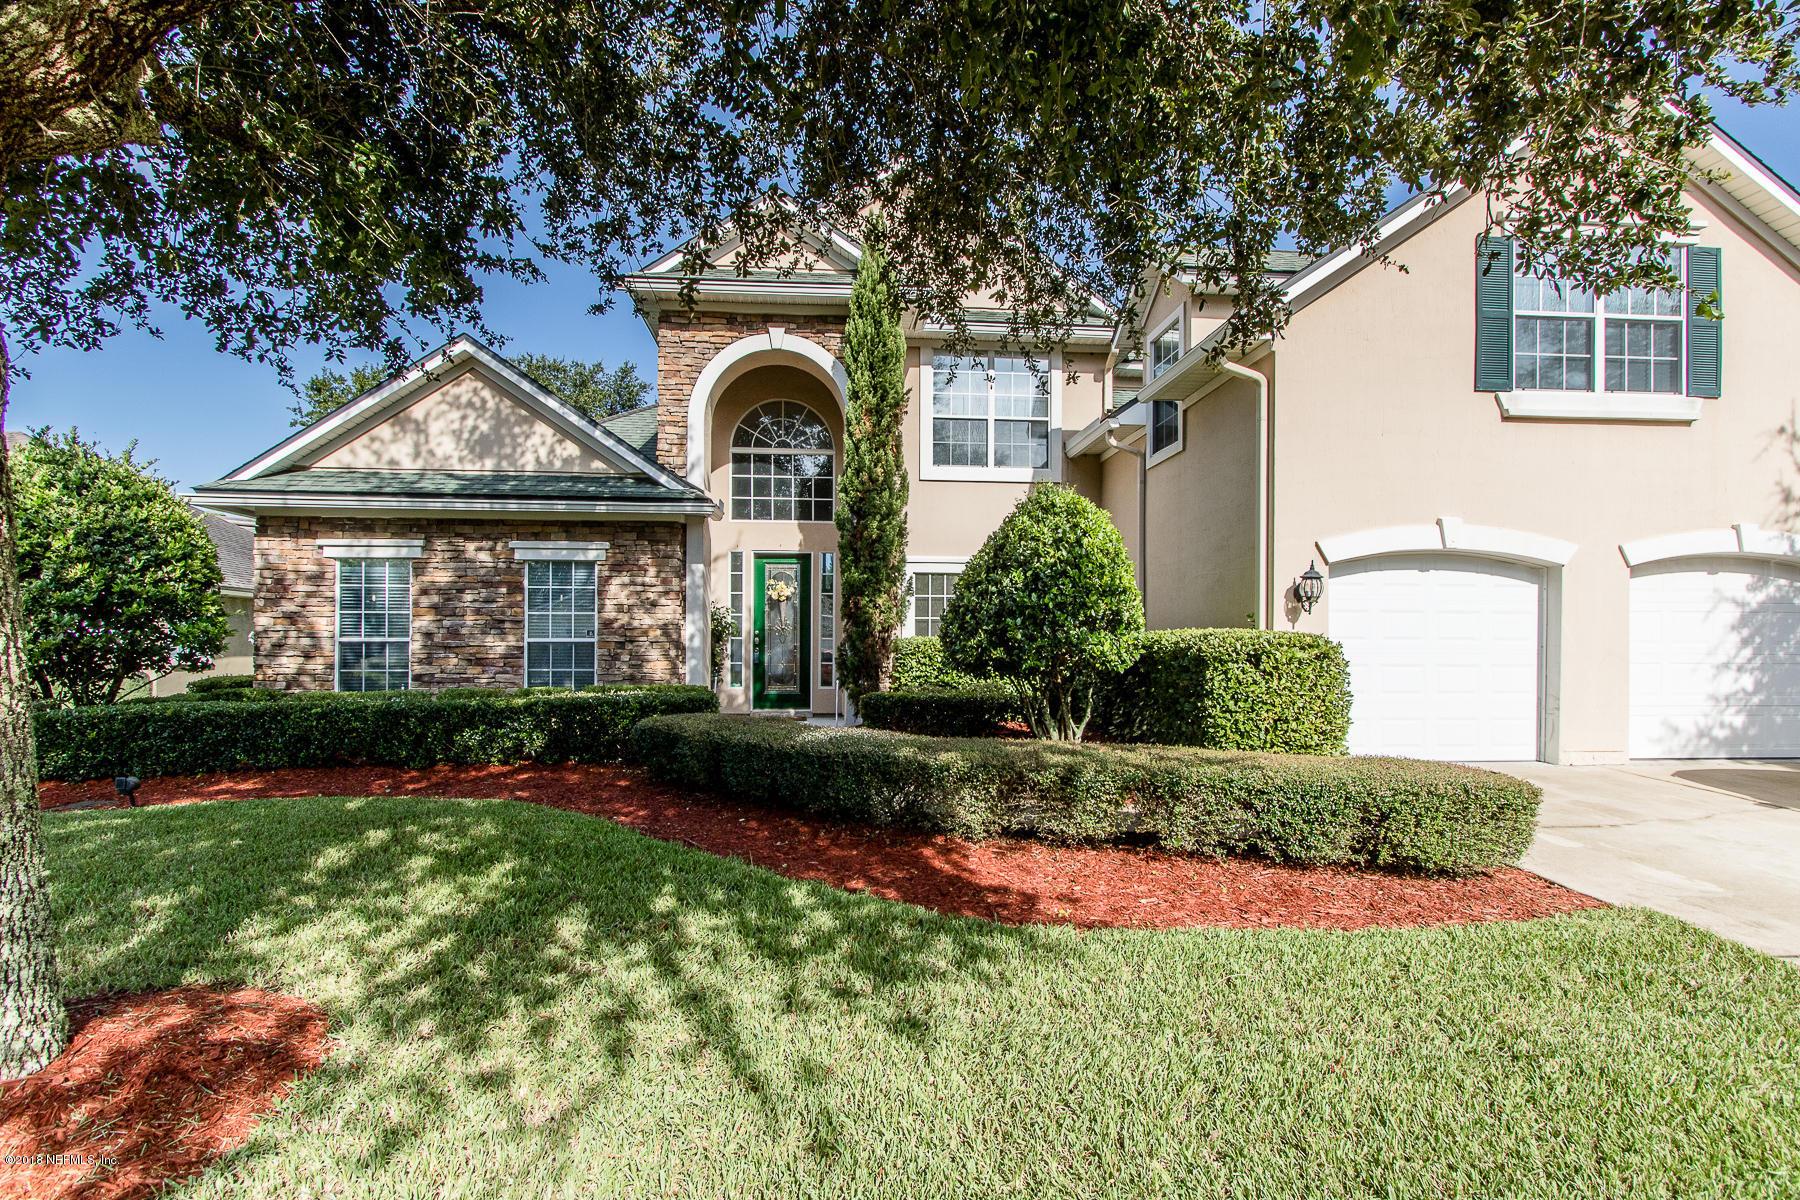 1322 AKRON OAKS, ORANGE PARK, FLORIDA 32065, 5 Bedrooms Bedrooms, ,4 BathroomsBathrooms,Residential - single family,For sale,AKRON OAKS,950065